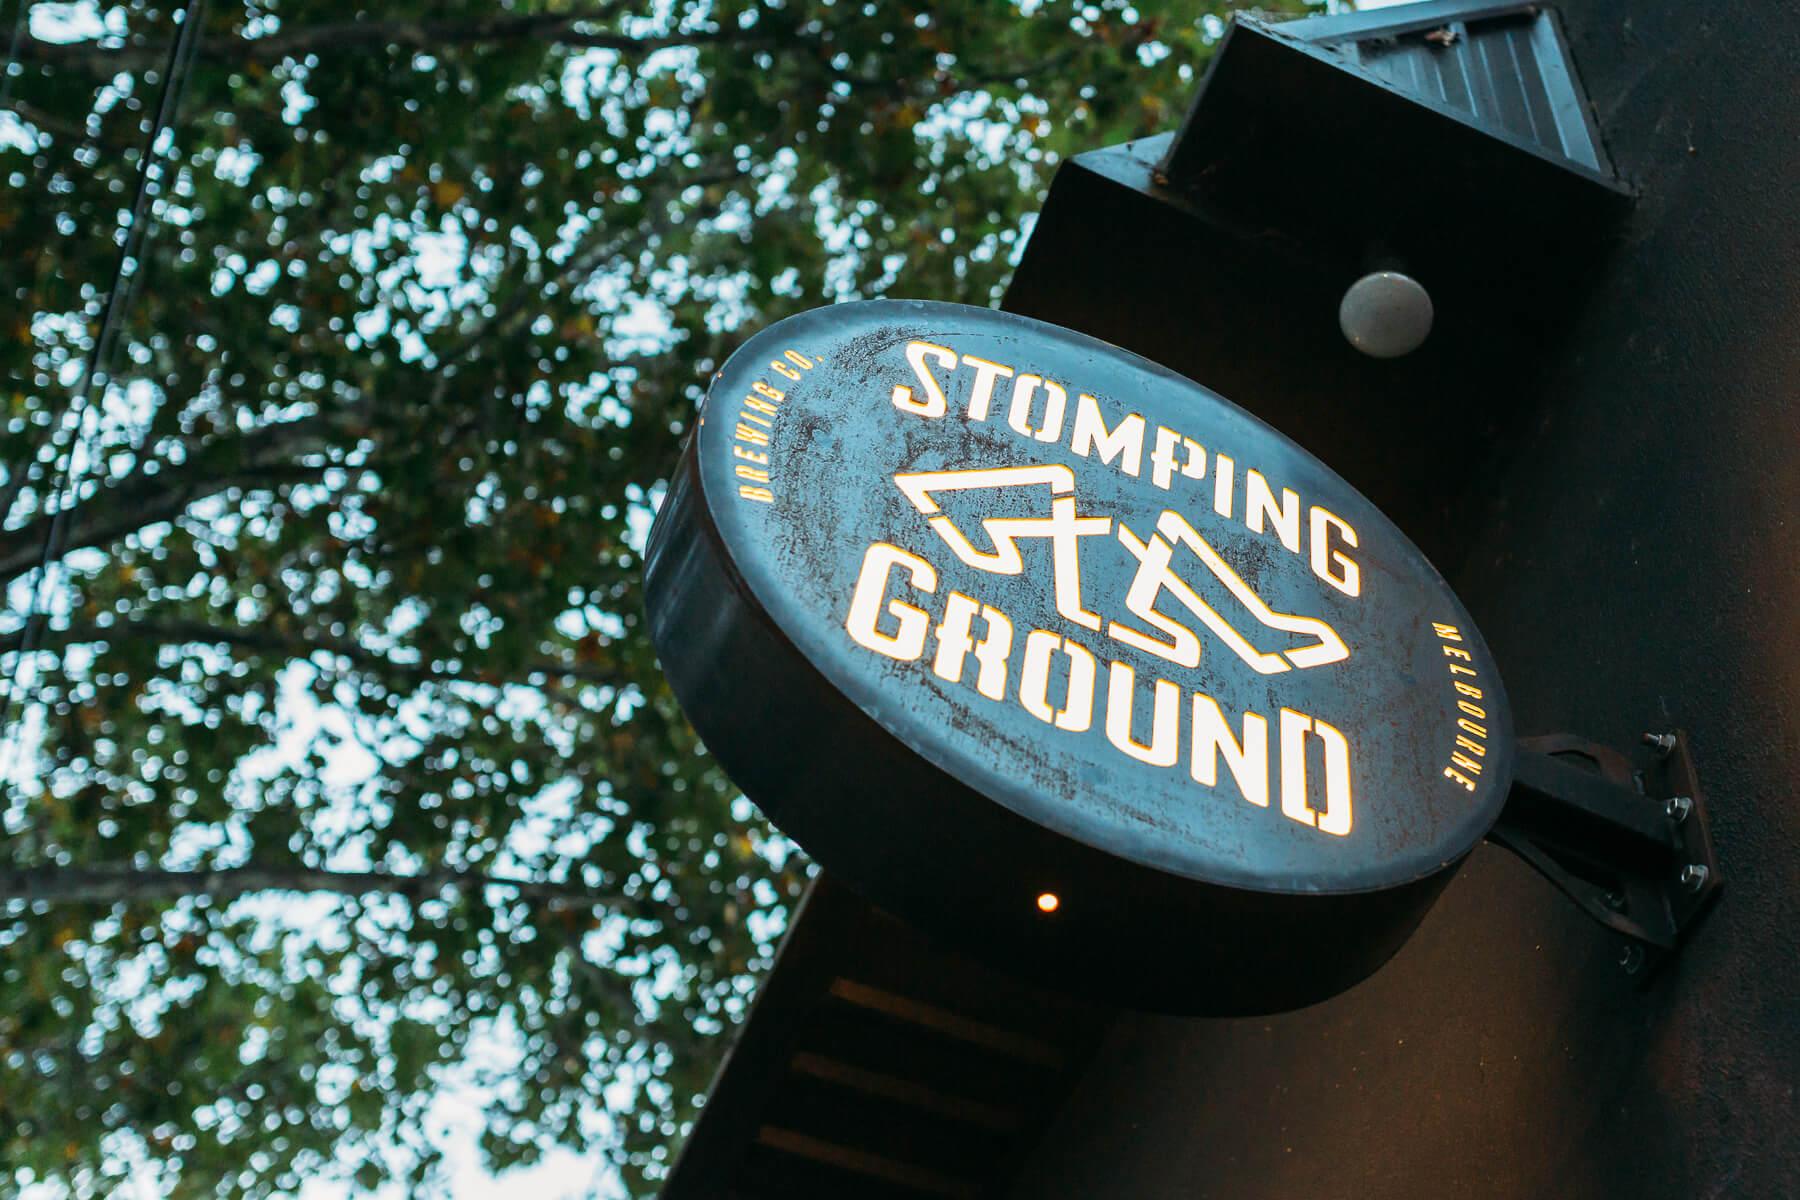 Stomping Ground_DHydePhoto Shoot 1 (60 of 75).jpg